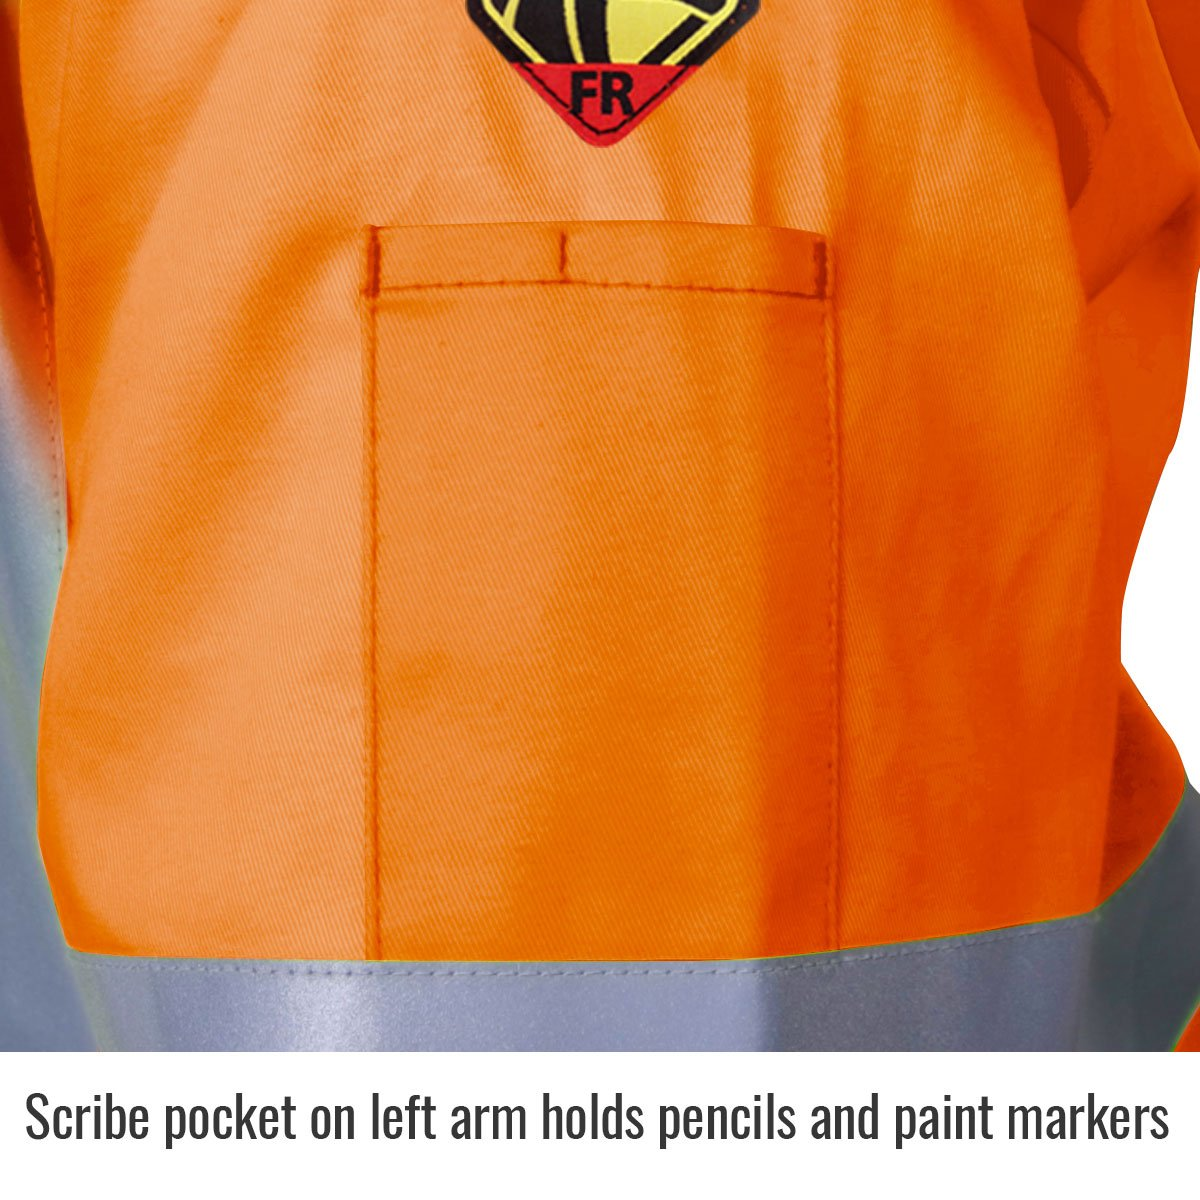 Revco JF1012-OR 30'' Hi-Vis 9 oz. Flame Resistant Cotton Welding Jacket by Black Stallion (Image #3)